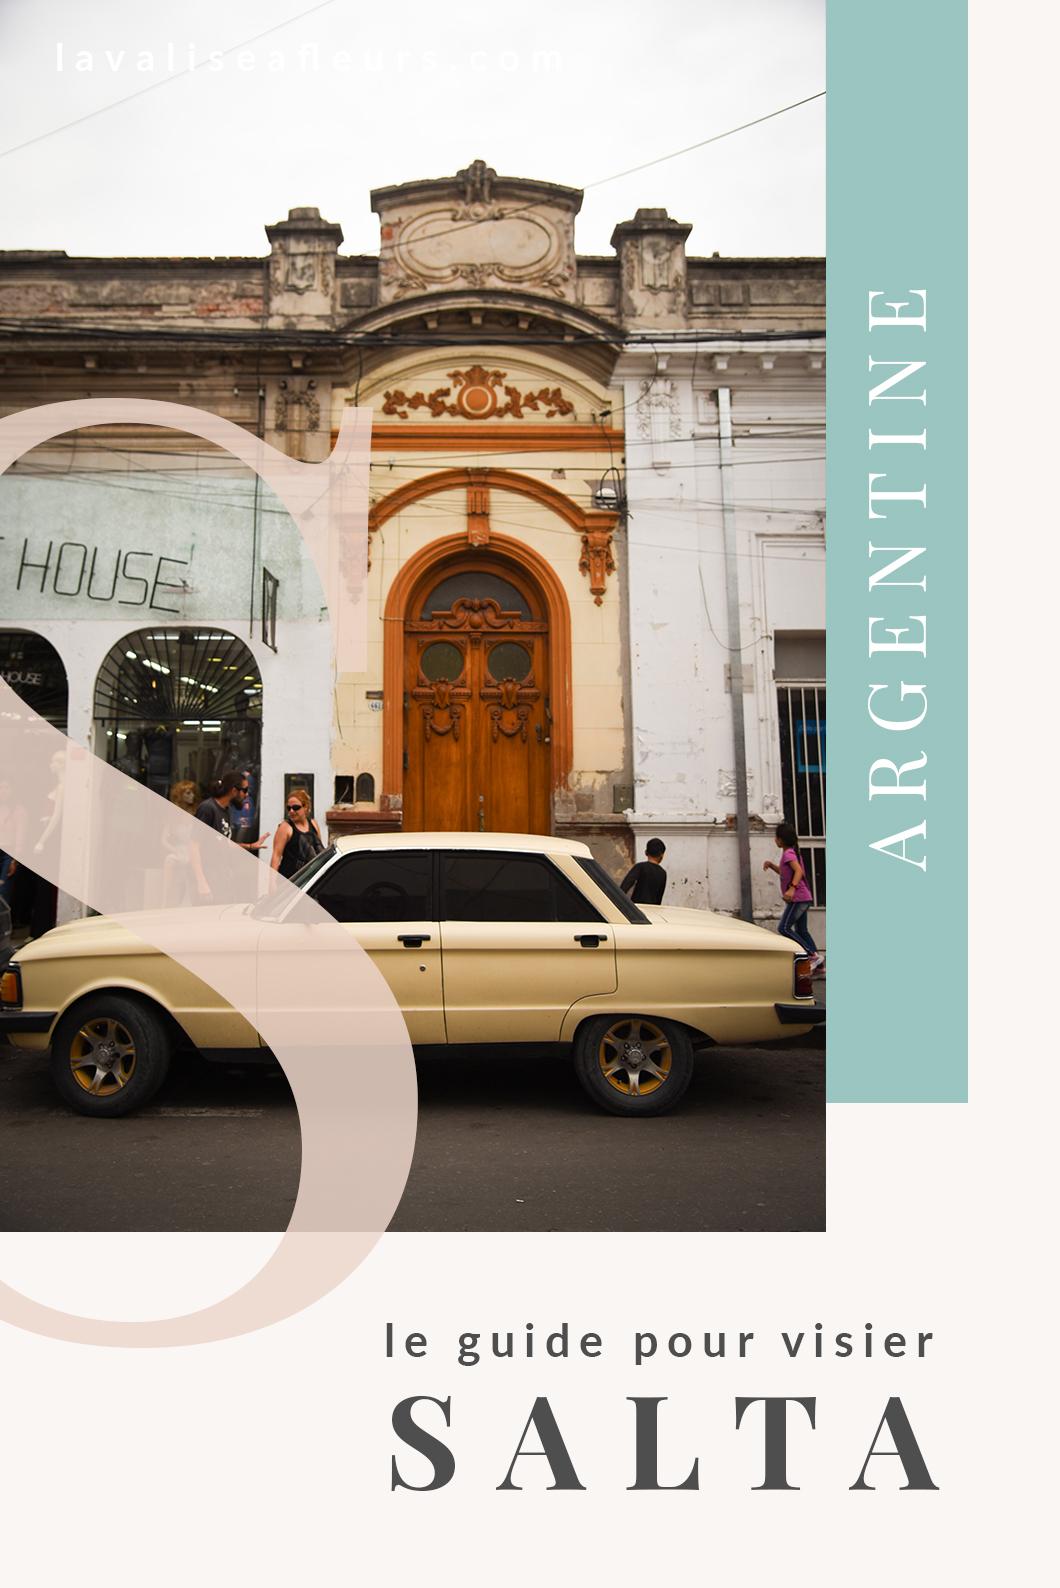 Guide pour visiter Salta en Argentine